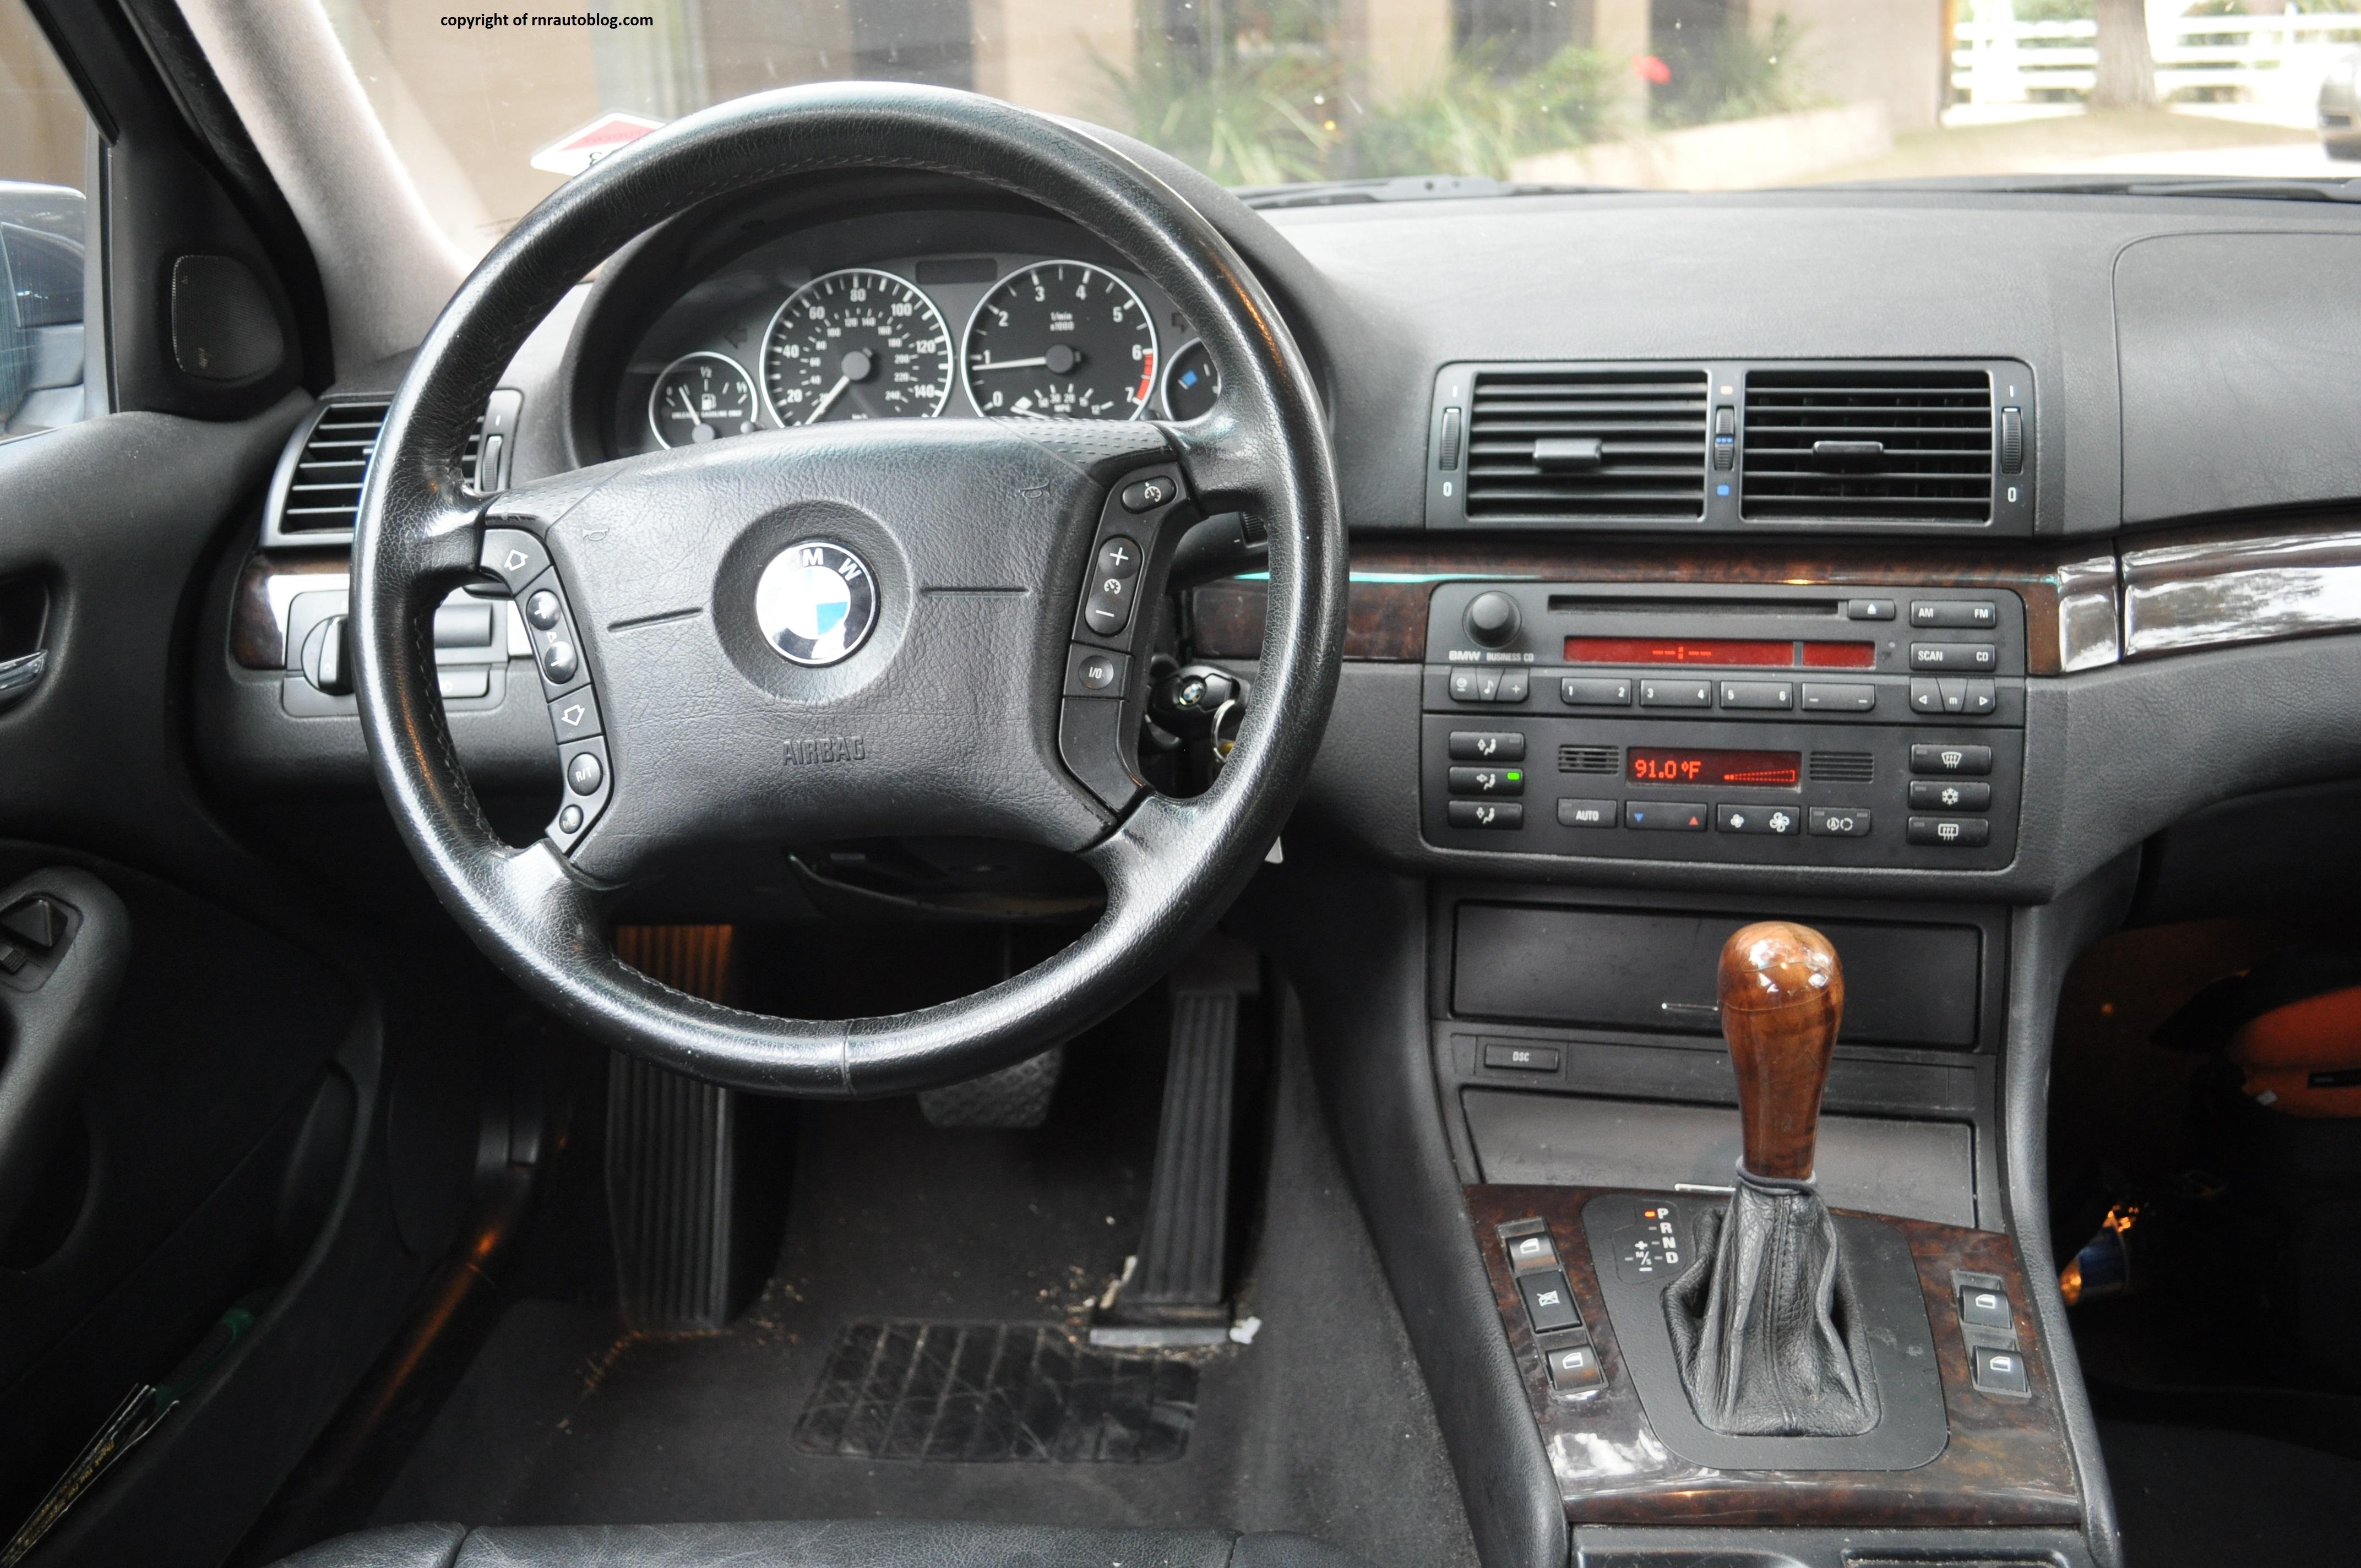 BMW I Review RNR Automotive Blog - 2001 bmw 328i